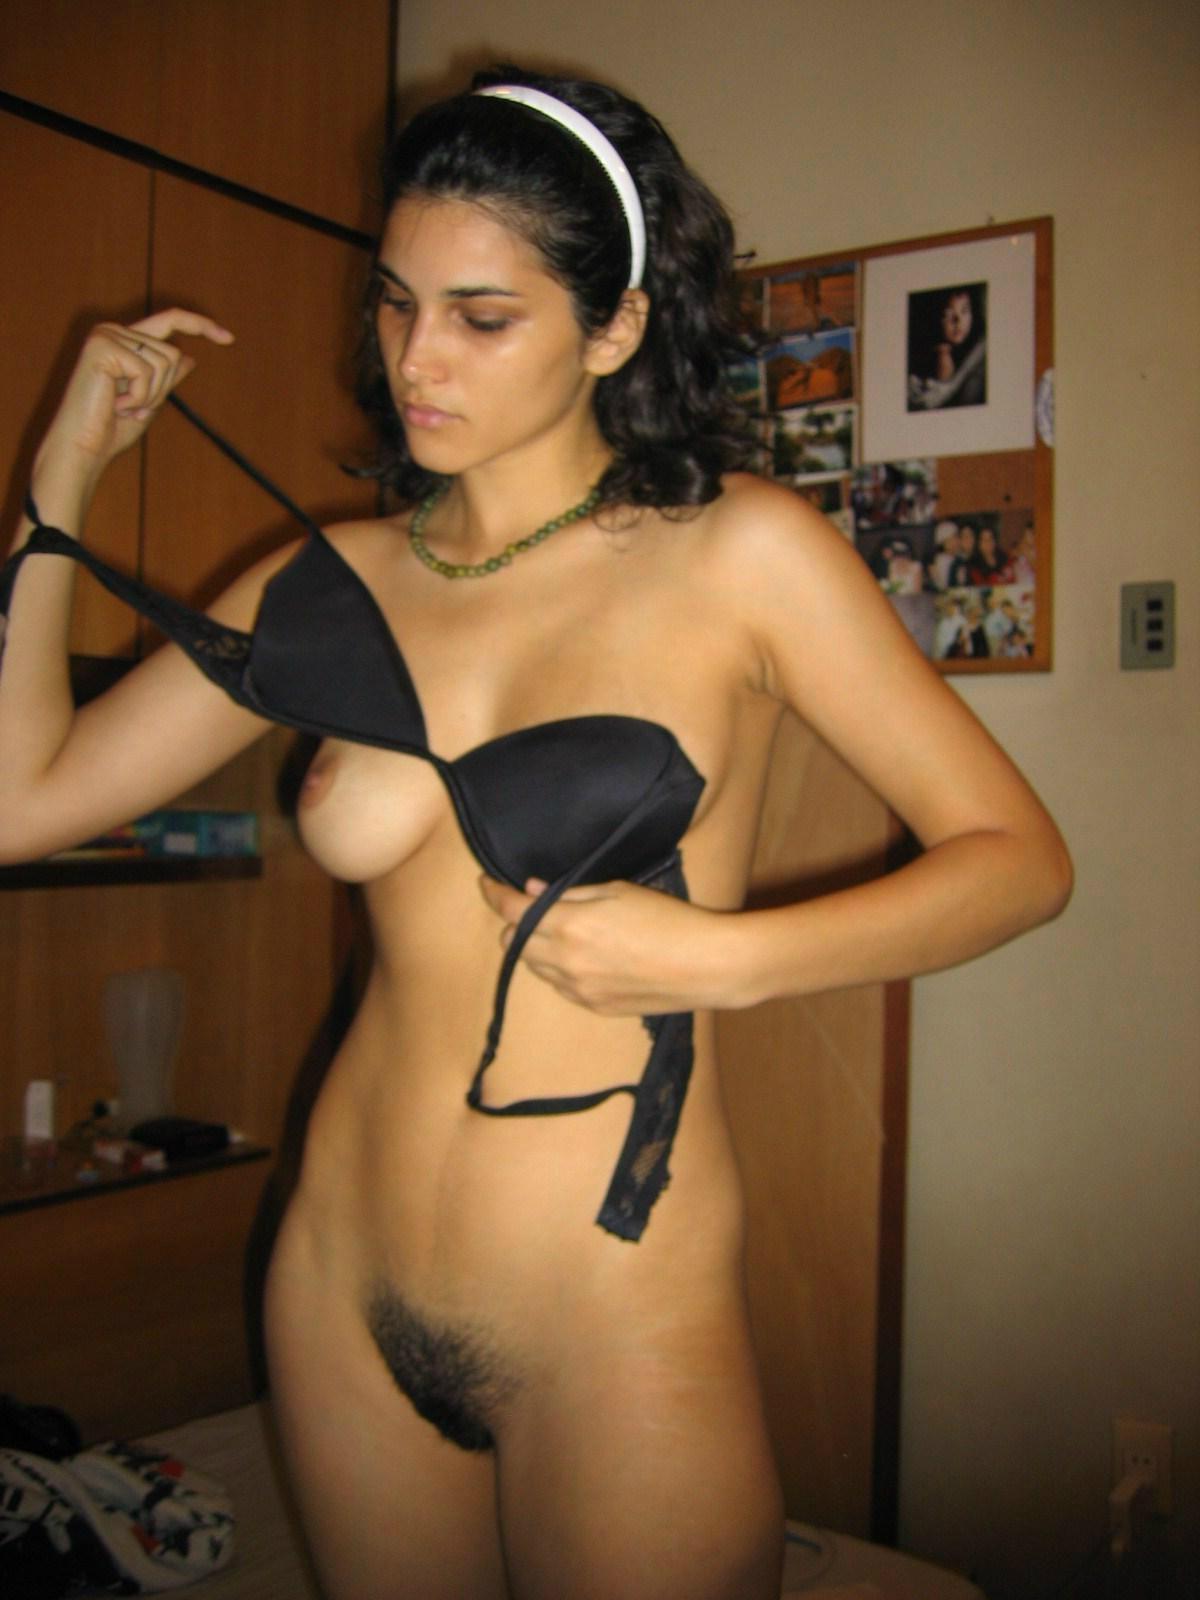 porn star having sex sucking cock